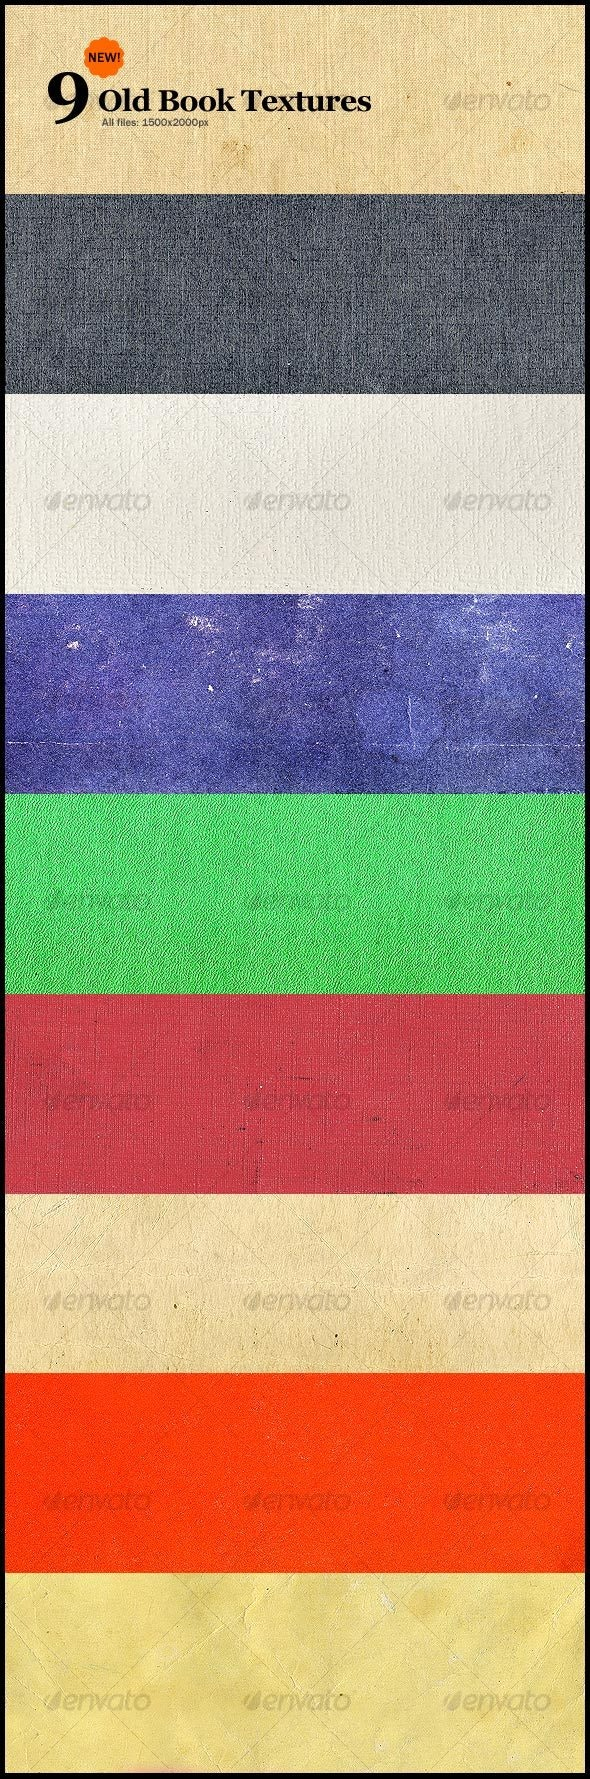 9 New Old Book Textures - Paper Textures